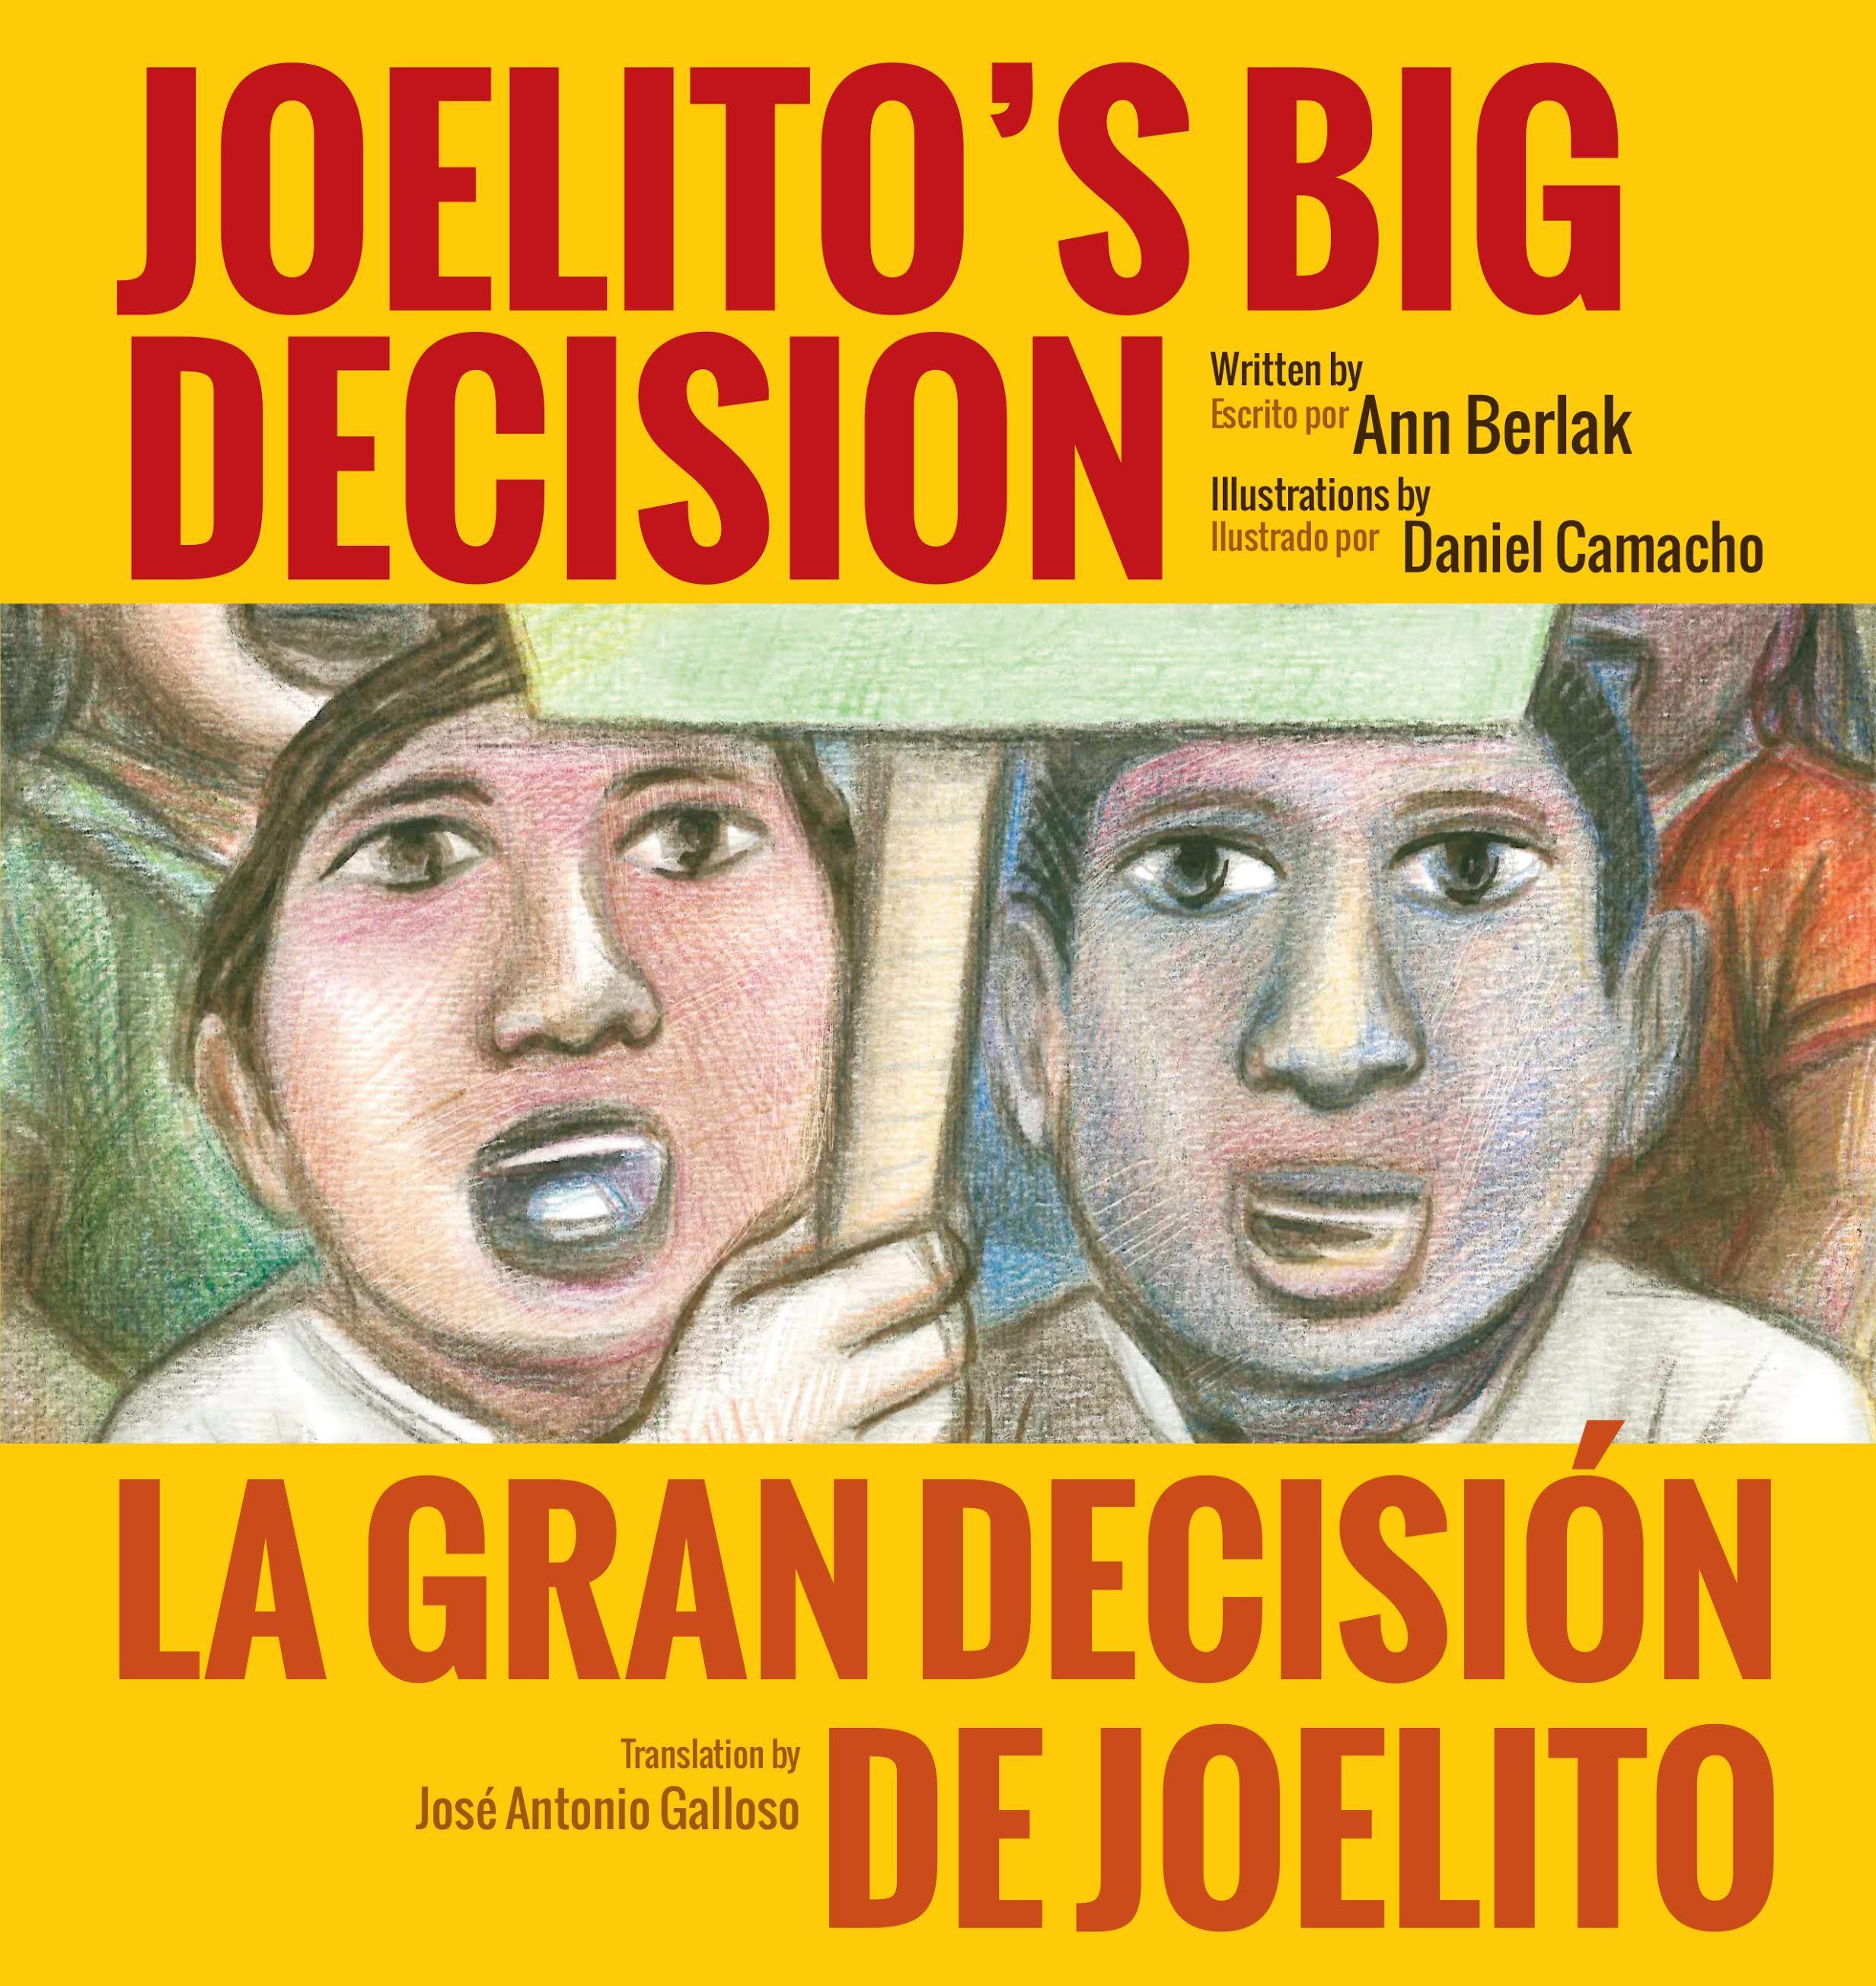 Review Joelito S Big Decision Multicultural Children S Book Day 学习sprachen Big Decisions Books Childrens Books